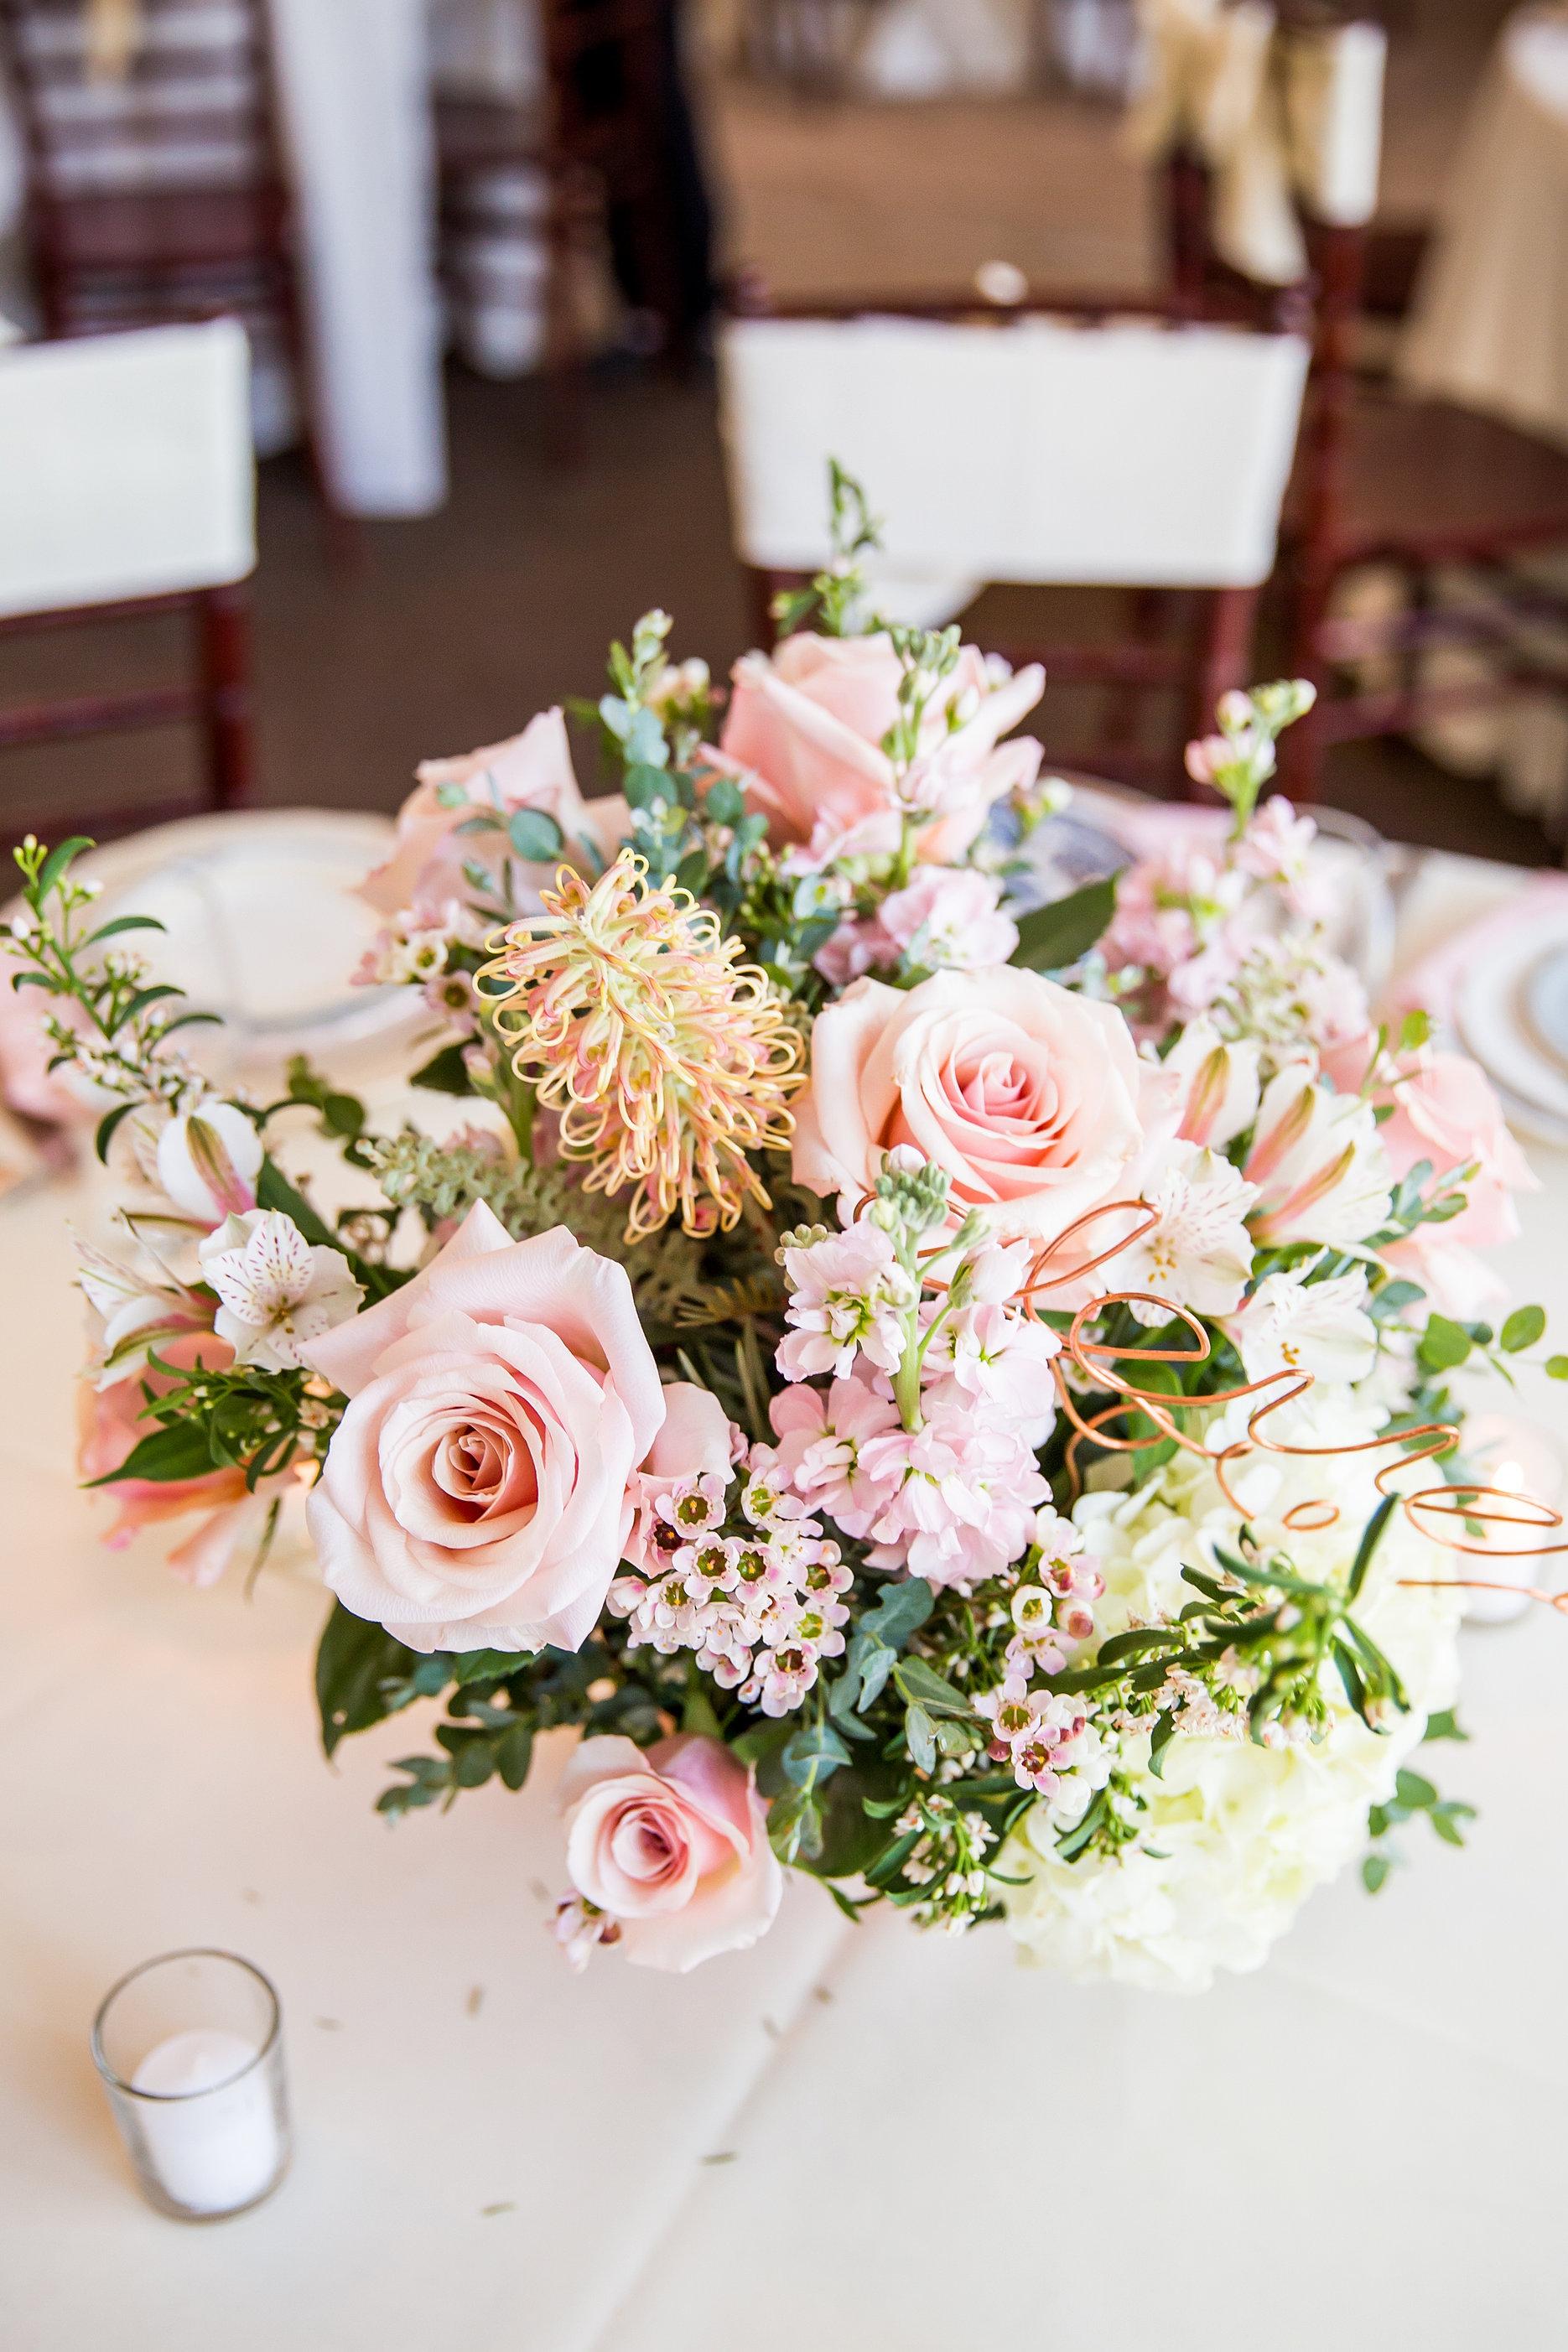 flowers by azalea san diego wedding flowers. Black Bedroom Furniture Sets. Home Design Ideas